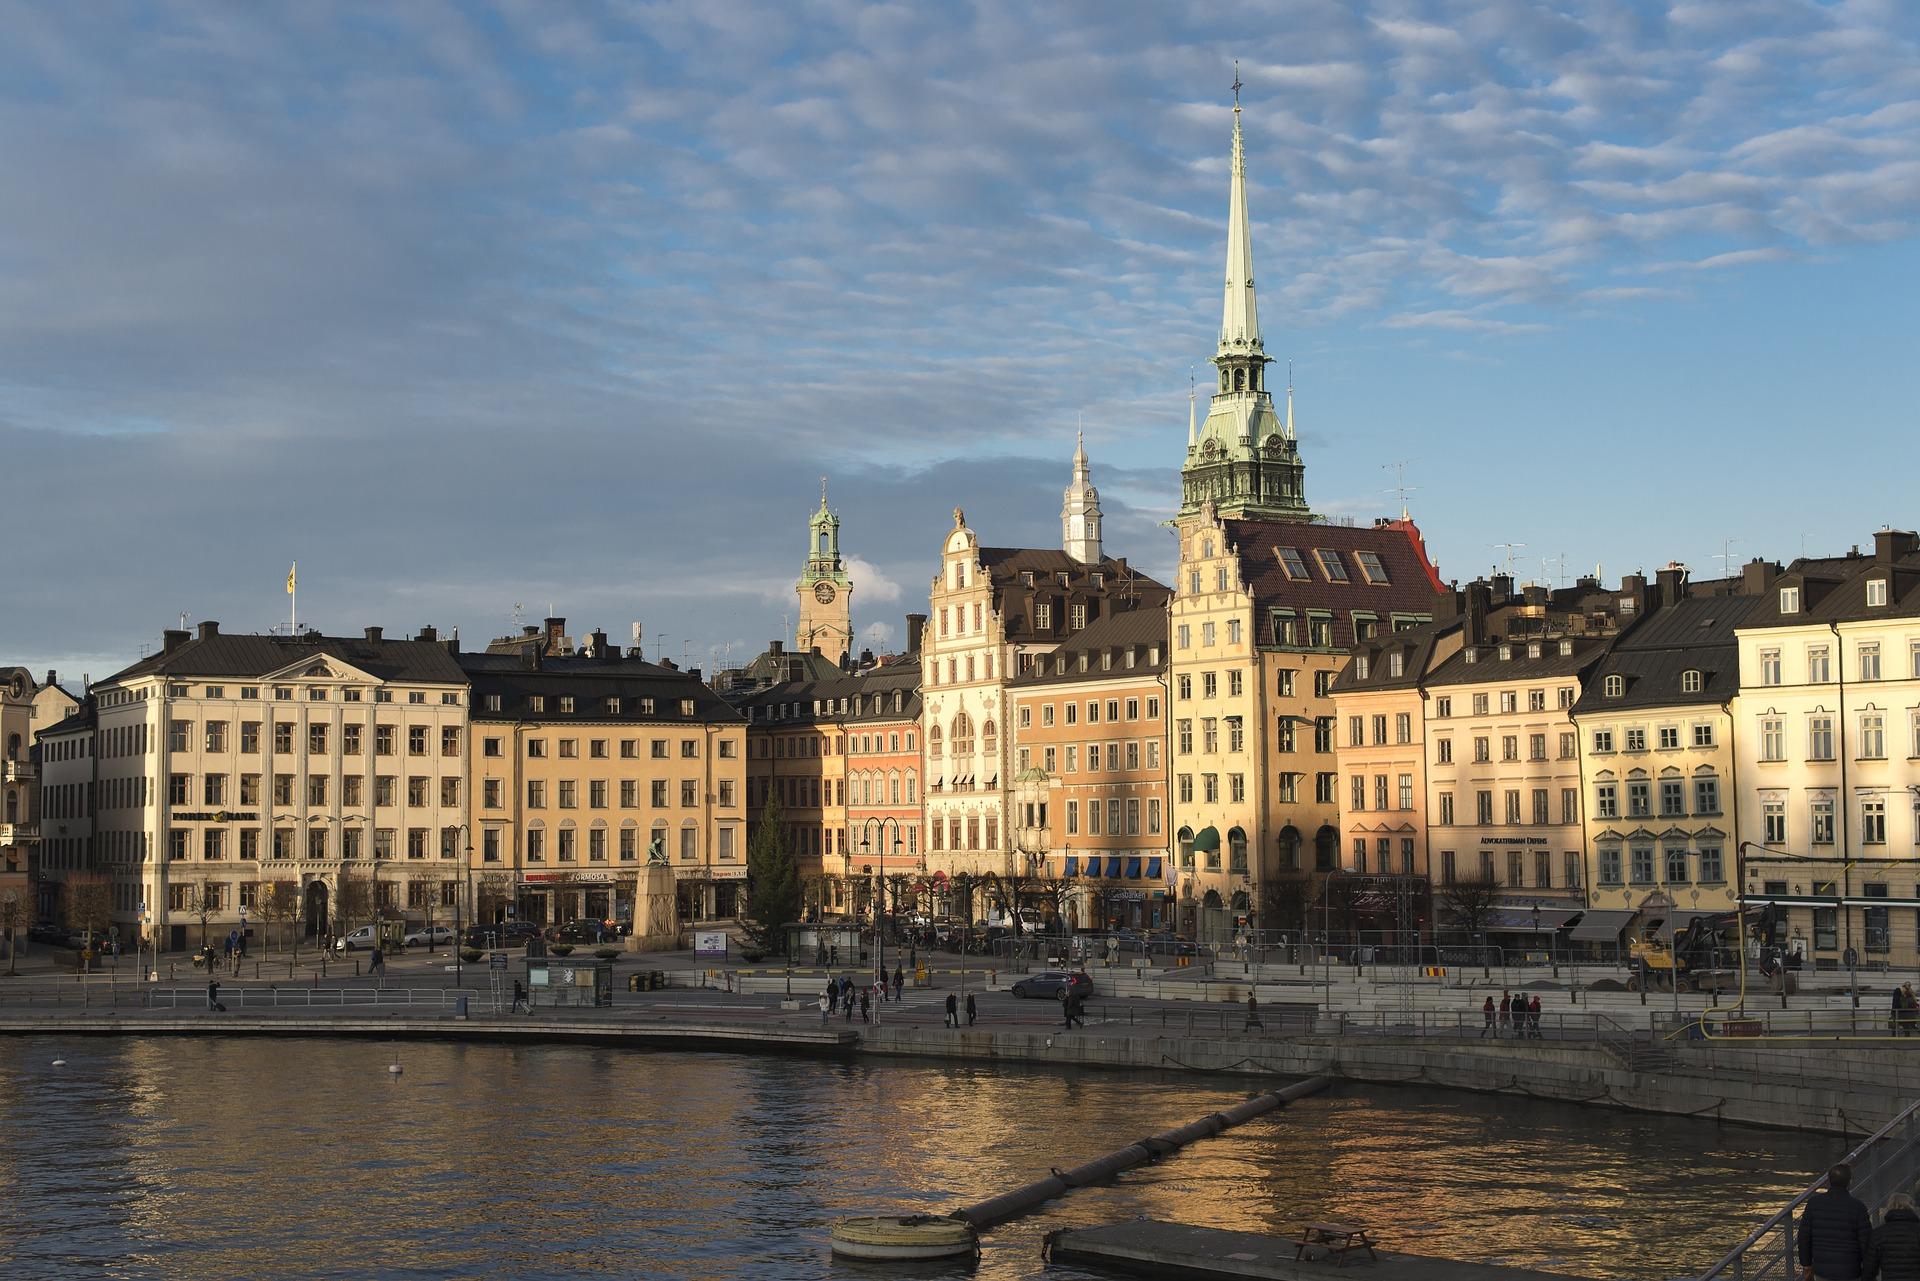 stockholm-718879_1920.jpg